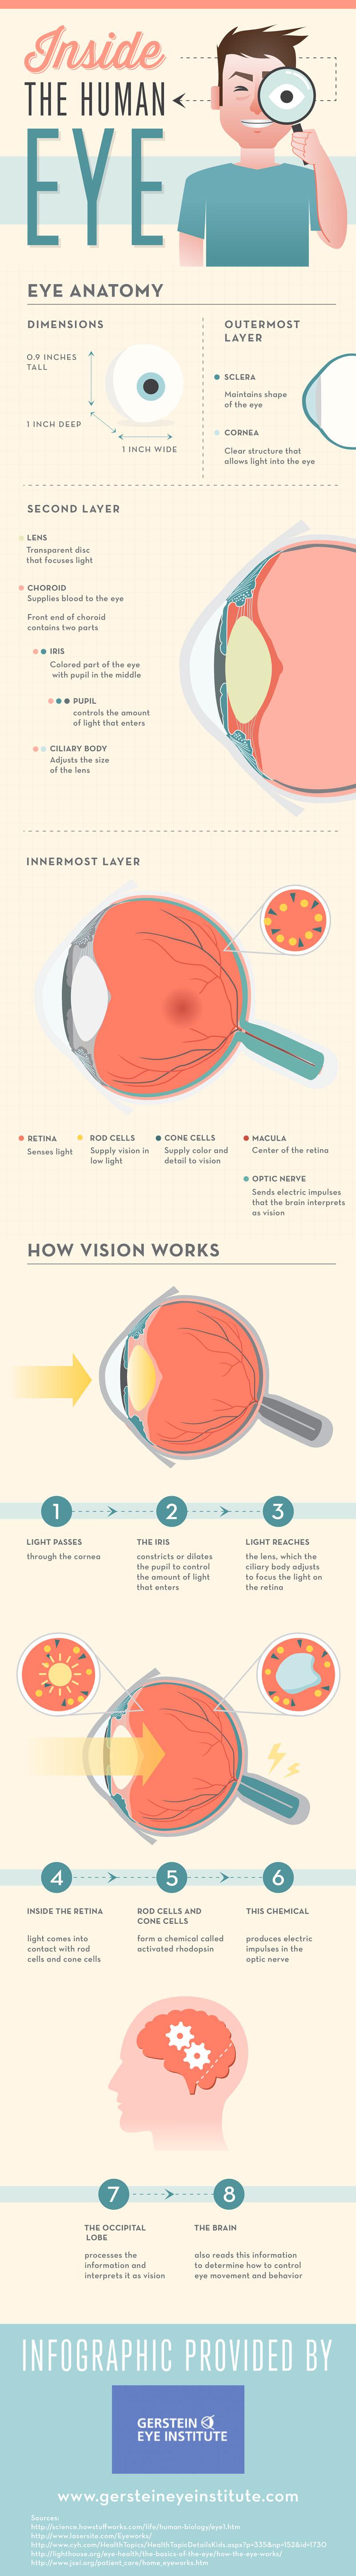 Inside The Human Eye Infographic | Nurse stuff | Pinterest | Clases ...